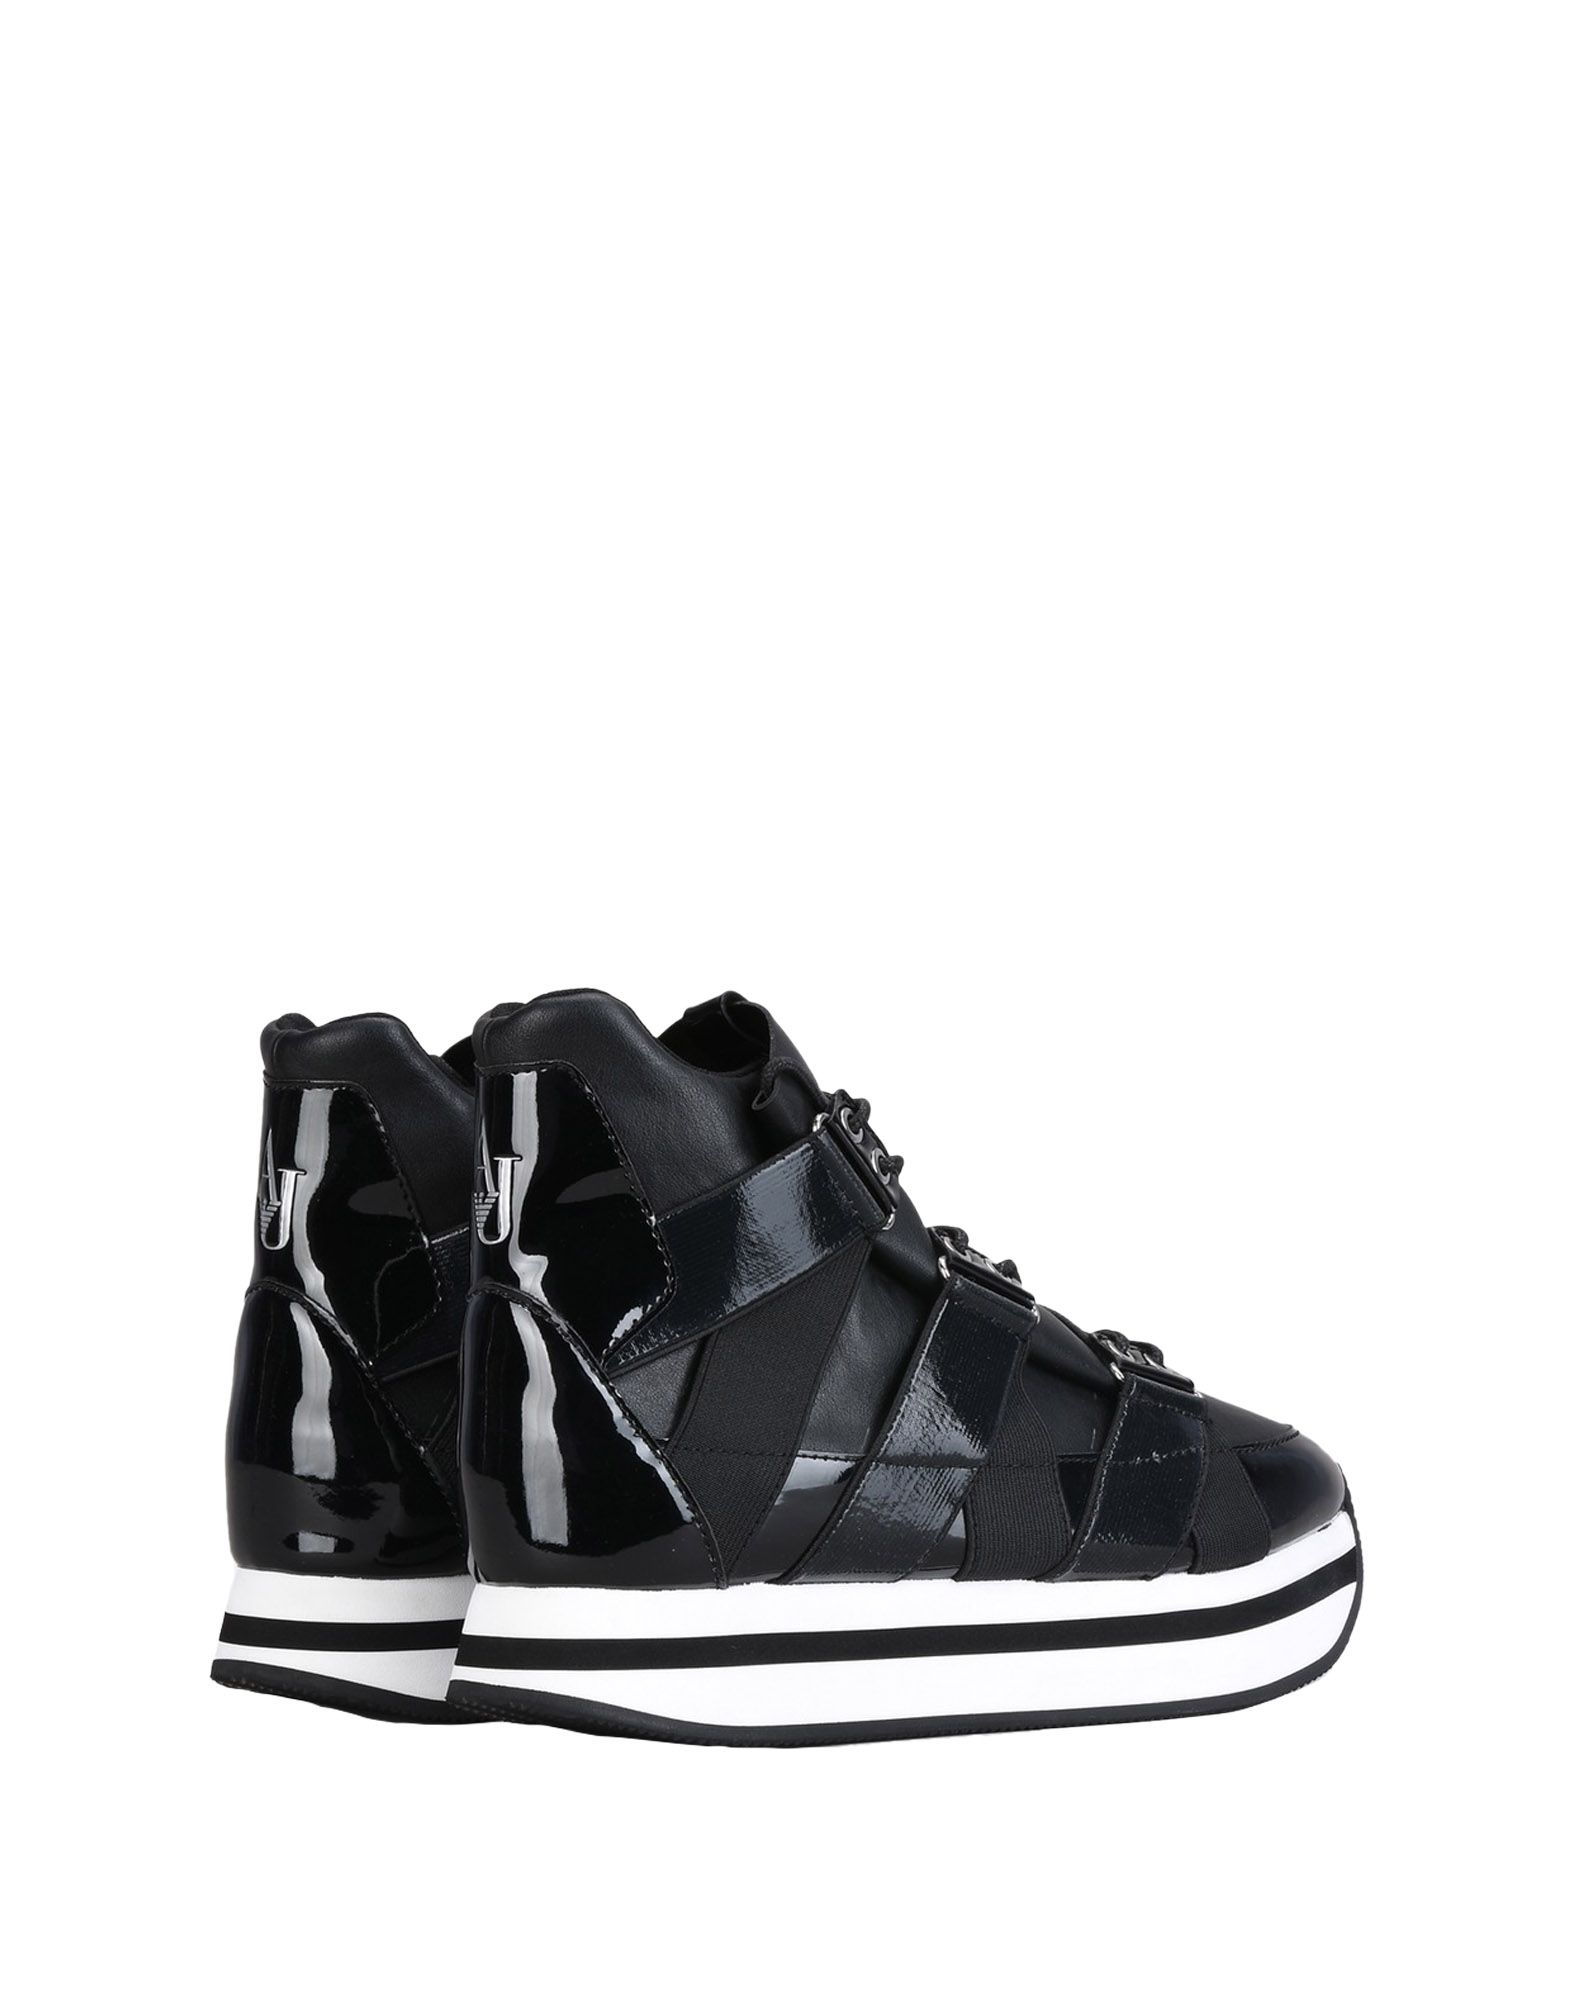 20caf4403f ARMANI JEANS ΠΑΠΟΥΤΣΙΑ Χαμηλά sneakers